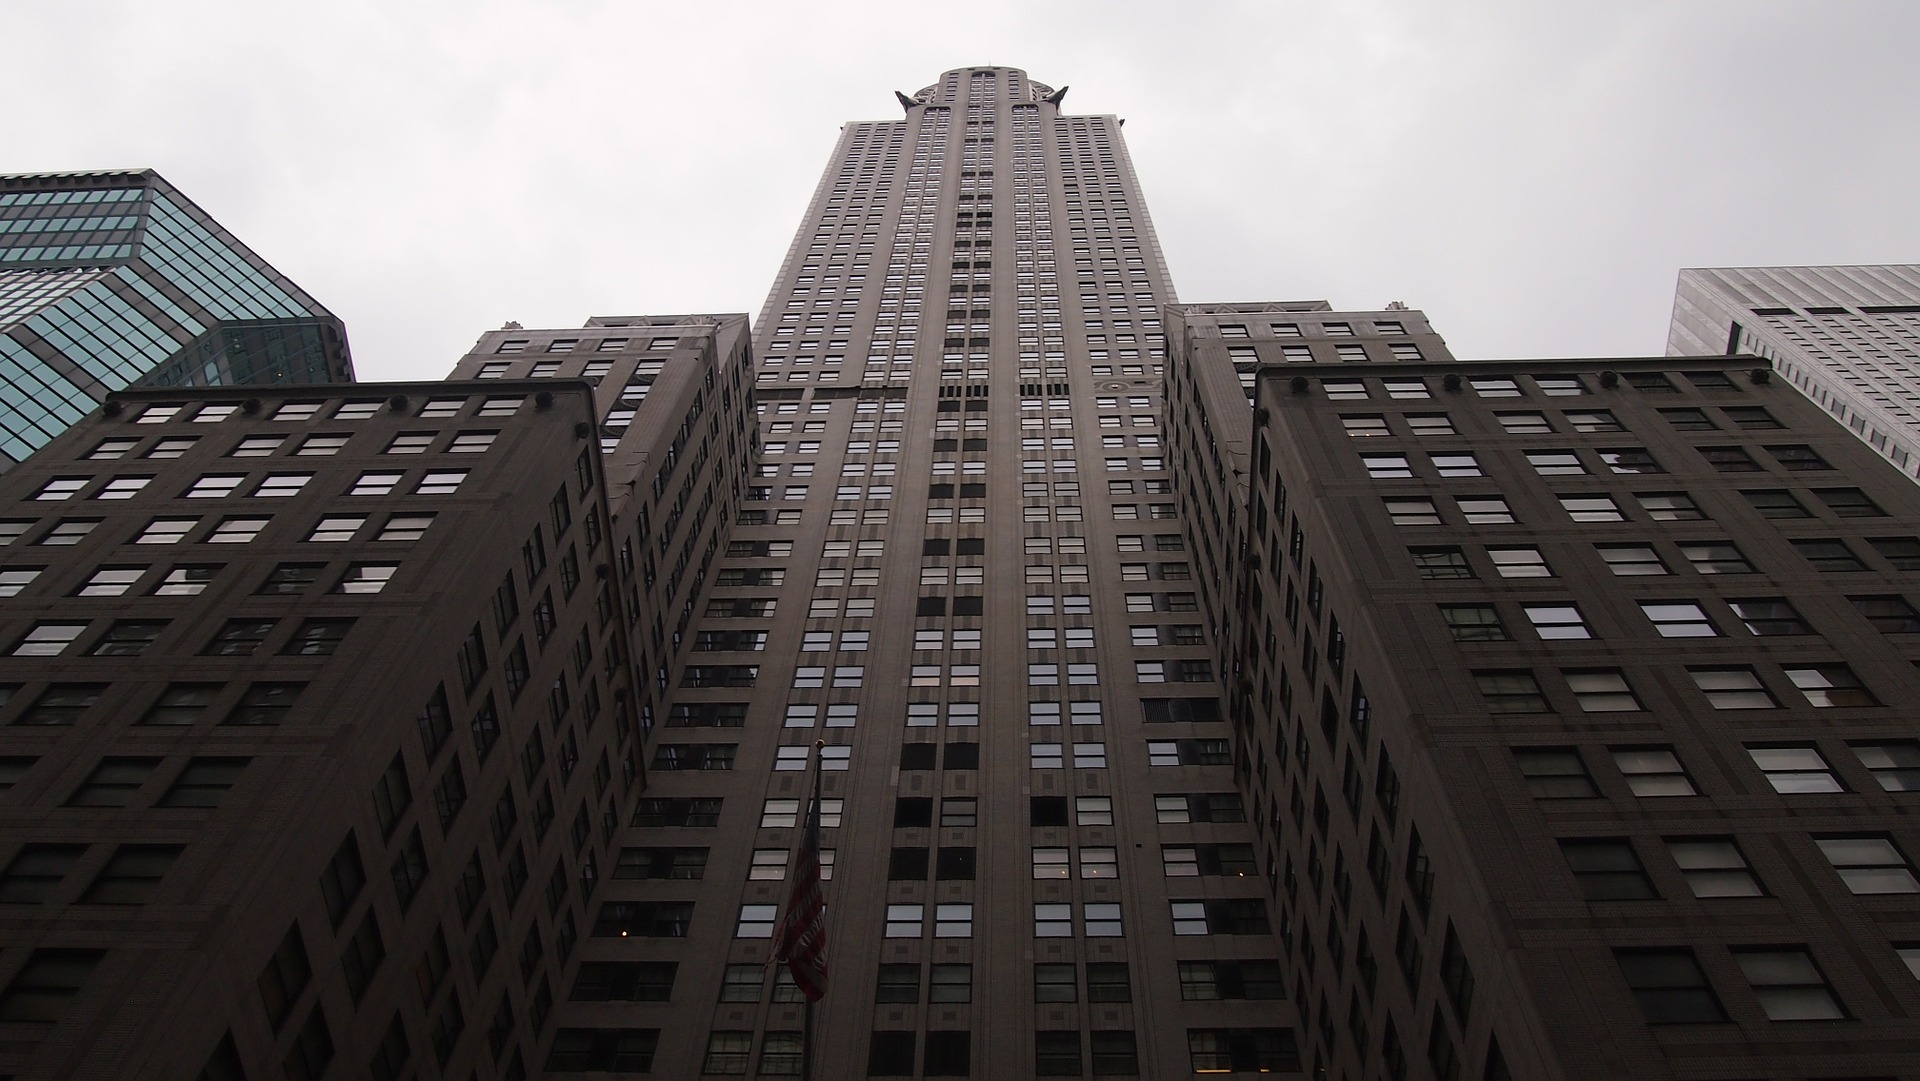 The Chrysler Building, New York City, USA